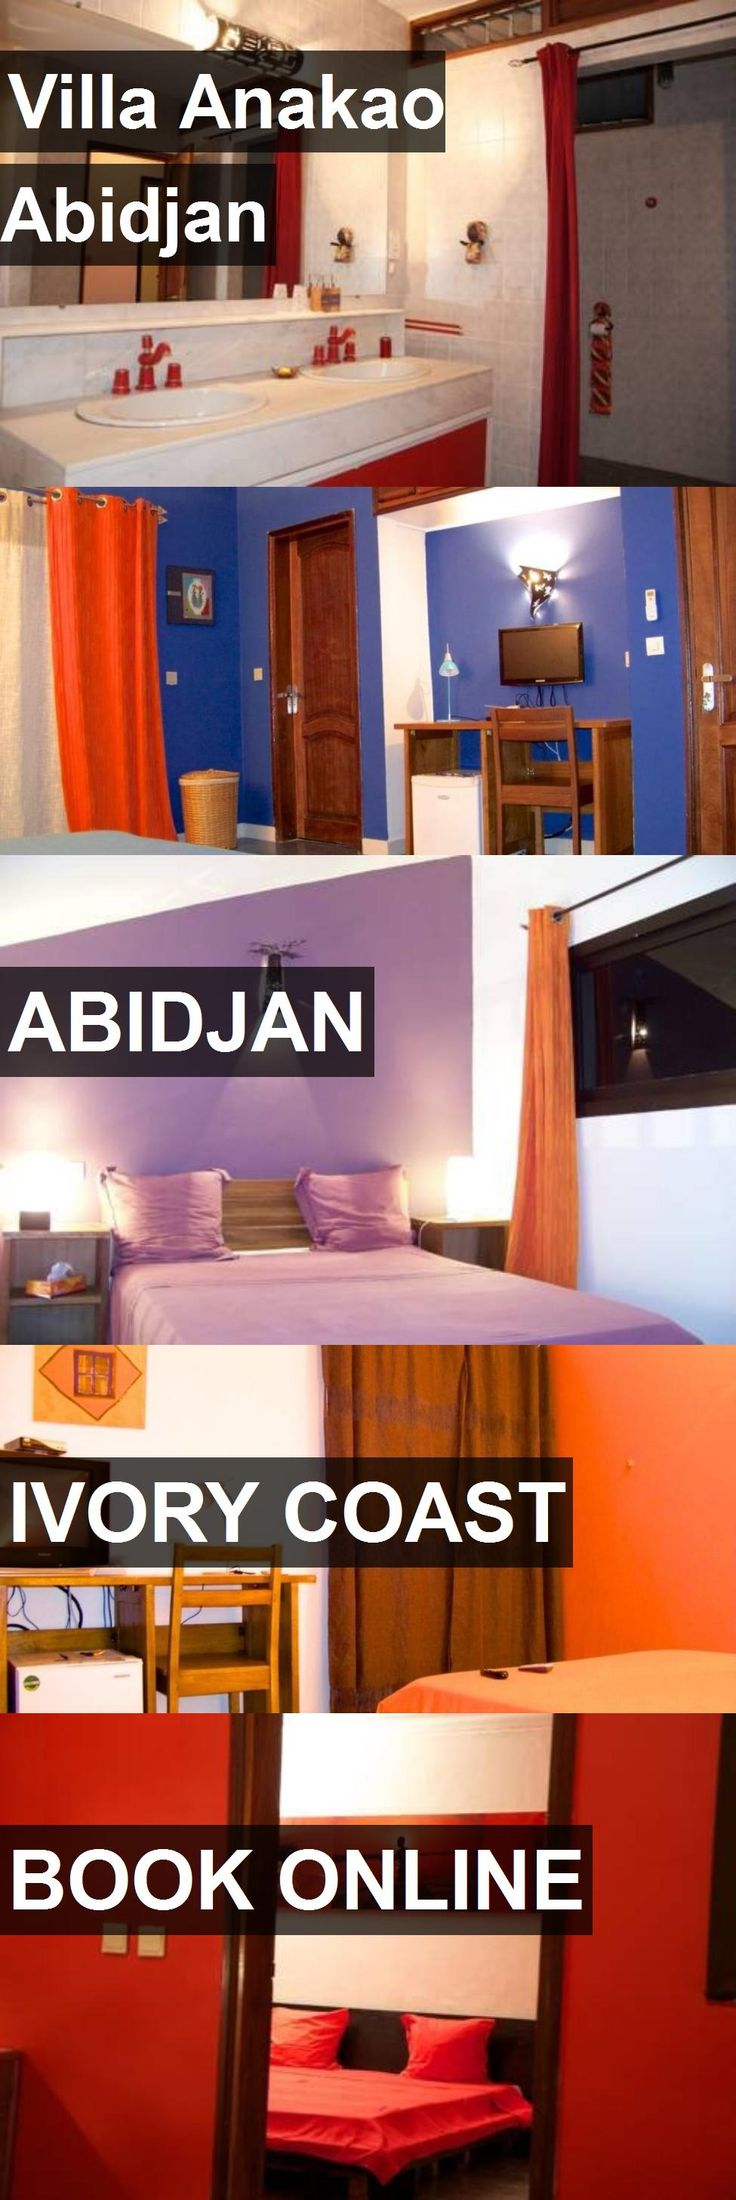 Hotel Villa Anakao Abidjan in Abidjan, Ivory Coast. For more information, photos, reviews and best prices please follow the link. #IvoryCoast #Abidjan #VillaAnakaoAbidjan #hotel #travel #vacation